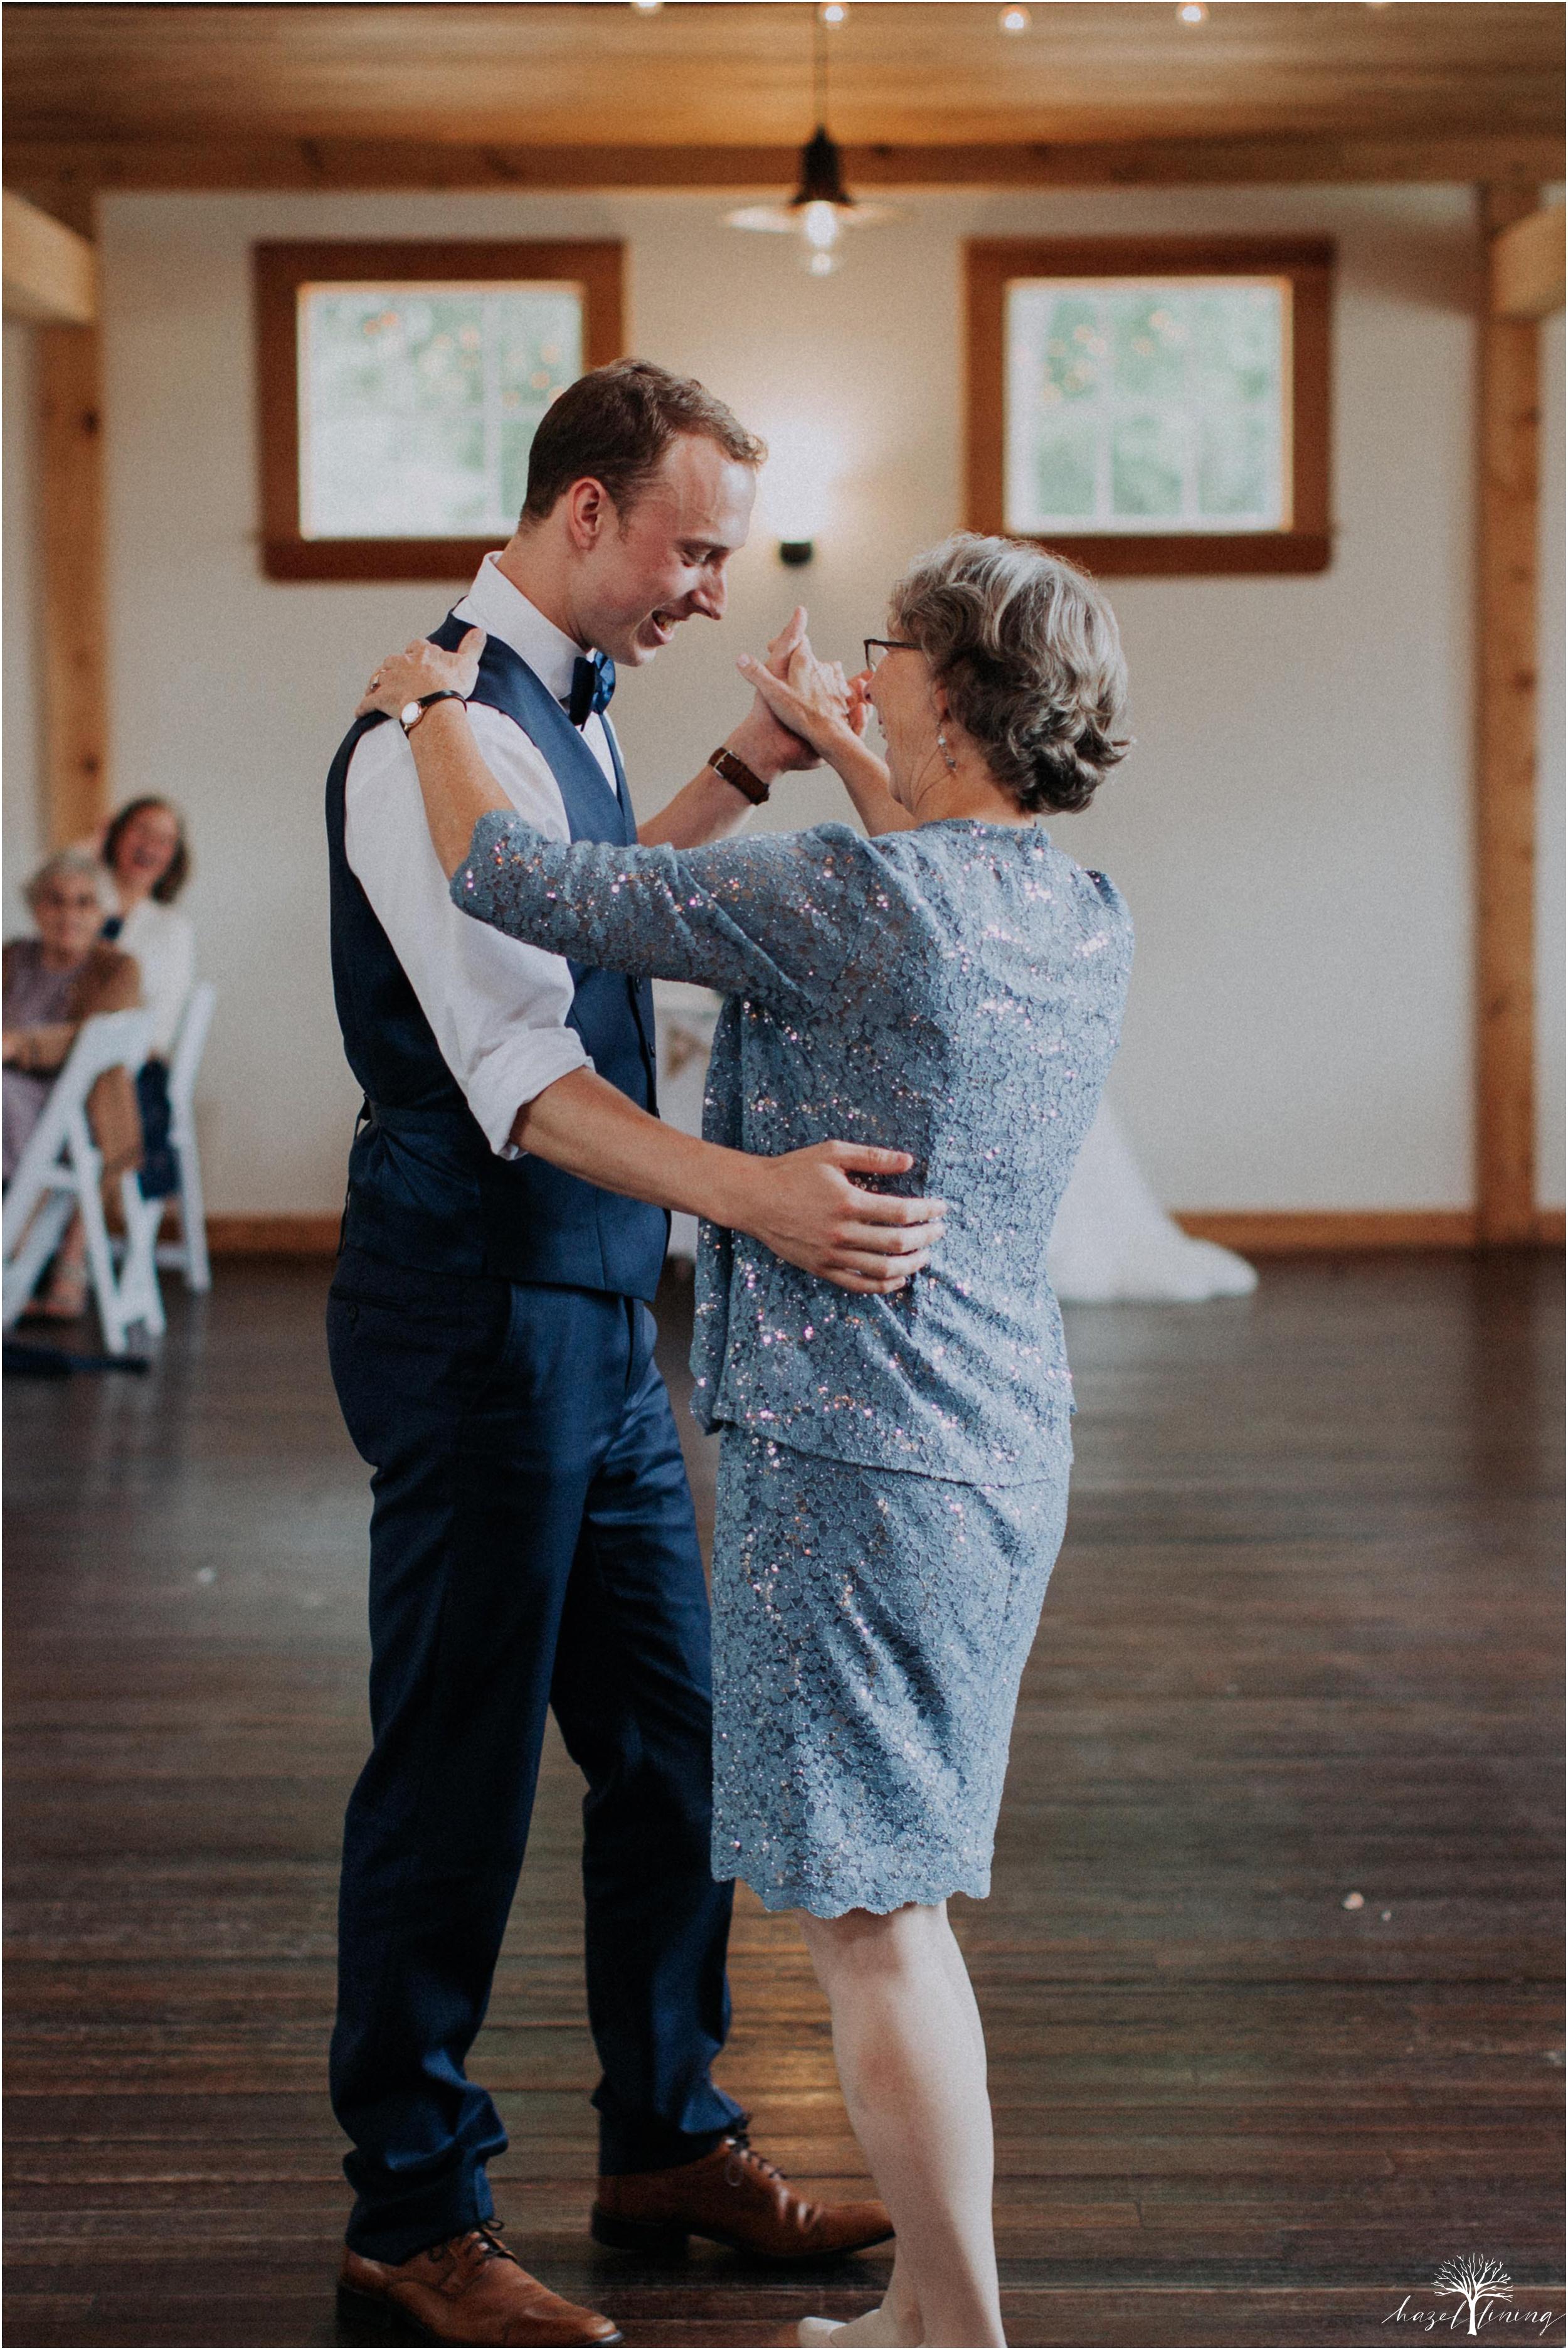 mariah-kreyling-samuel-sherratt-sherrattwiththeworld-peirce-farm-at-witch-hill-boston-massachusetts-wedding-photography-hazel-lining-travel-wedding-elopement-photography_0173.jpg